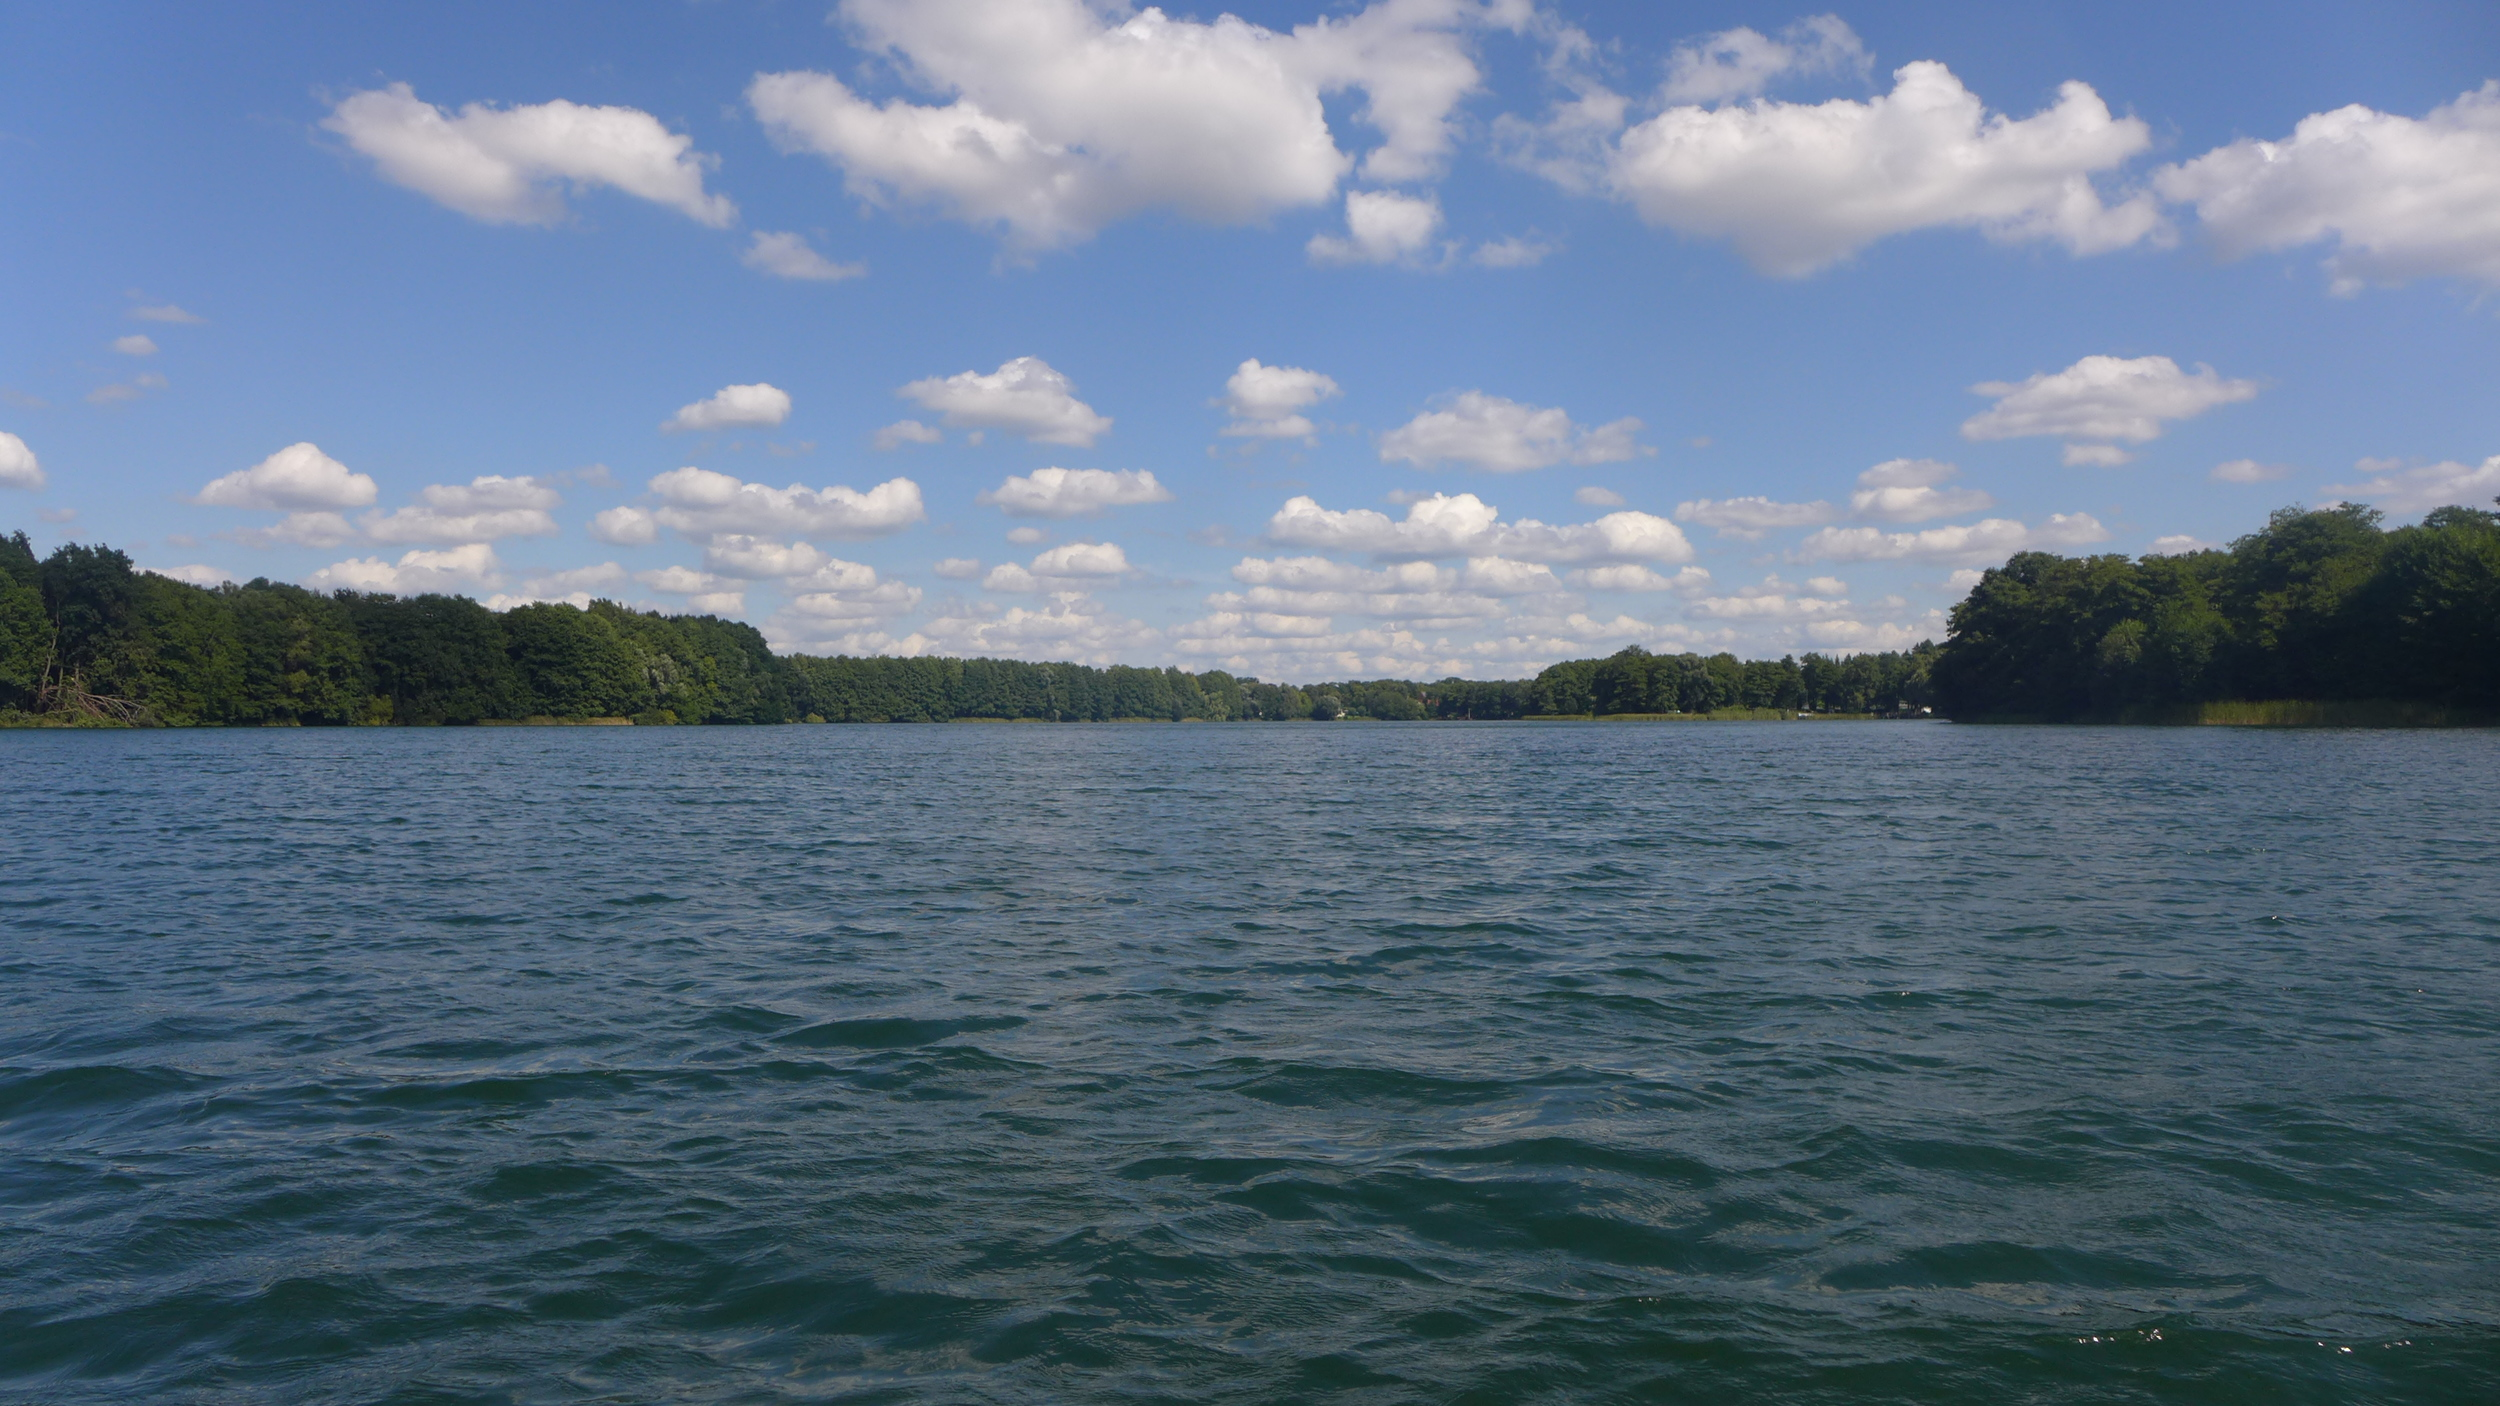 Groß Glienicke lake next to Alexander Haus